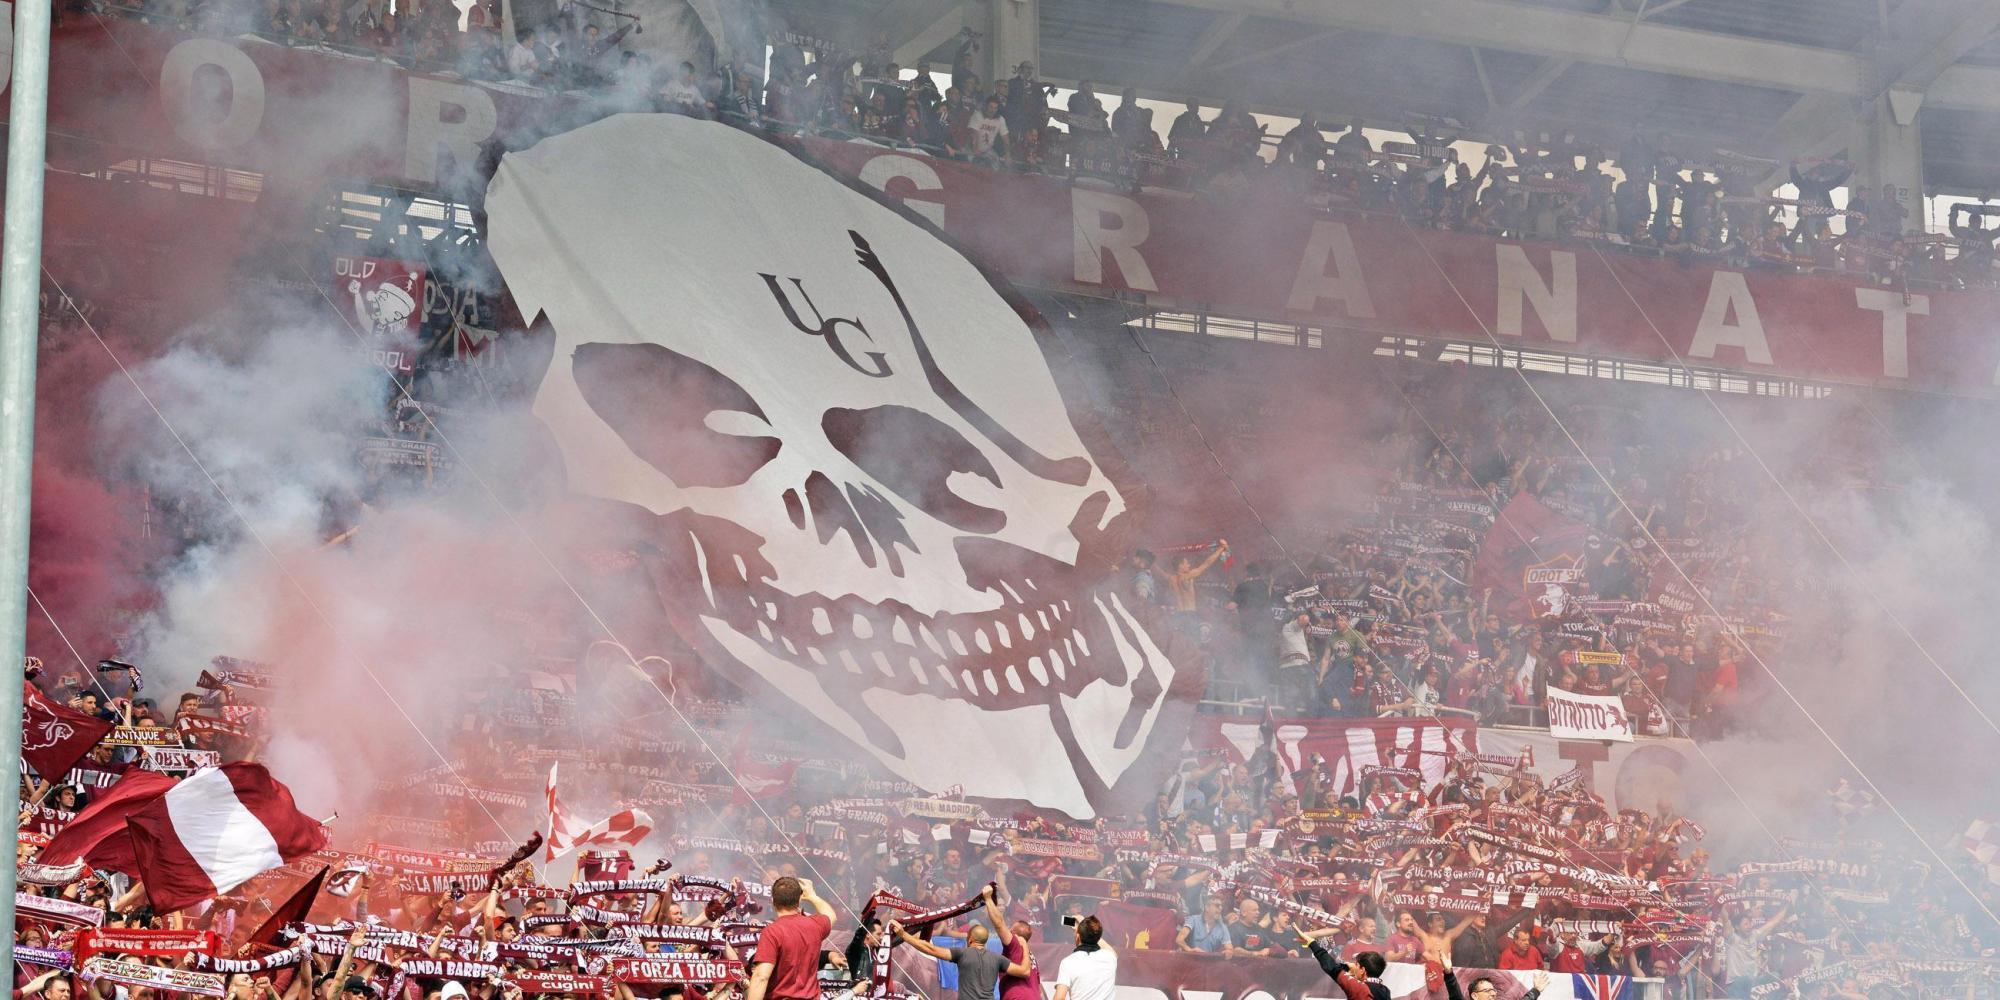 La curva del Torino